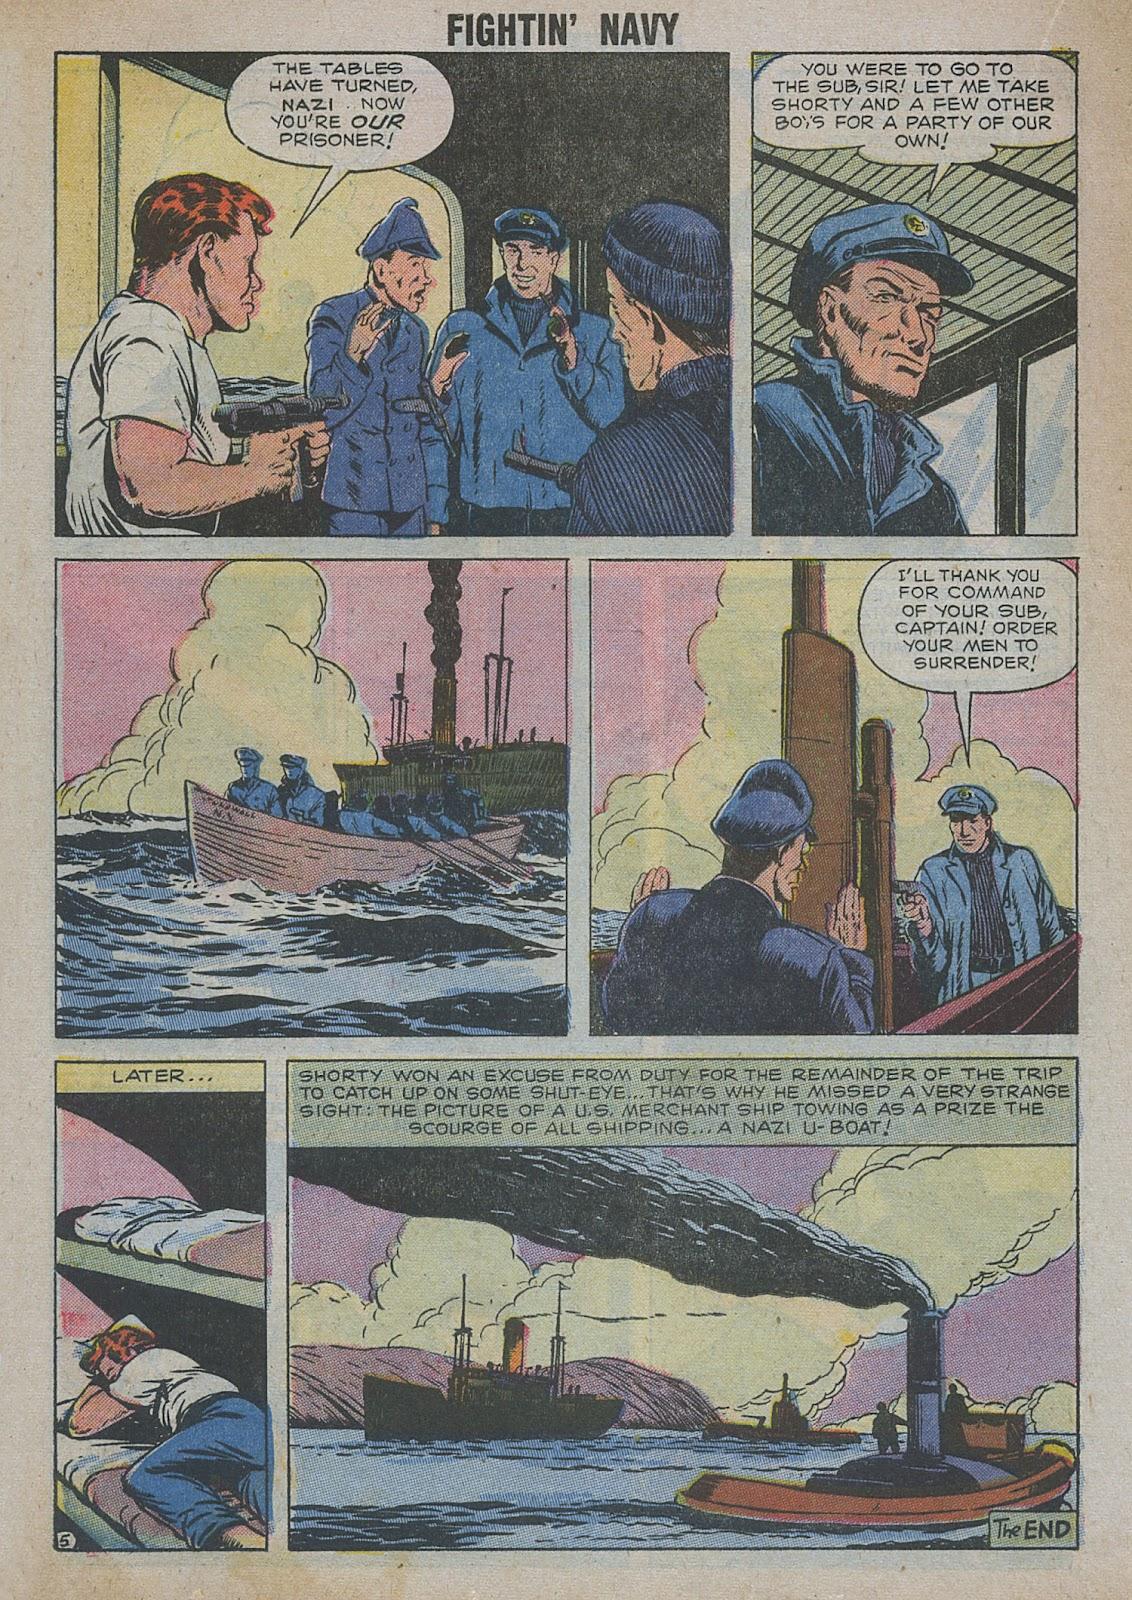 Read online Fightin' Navy comic -  Issue #82 - 26